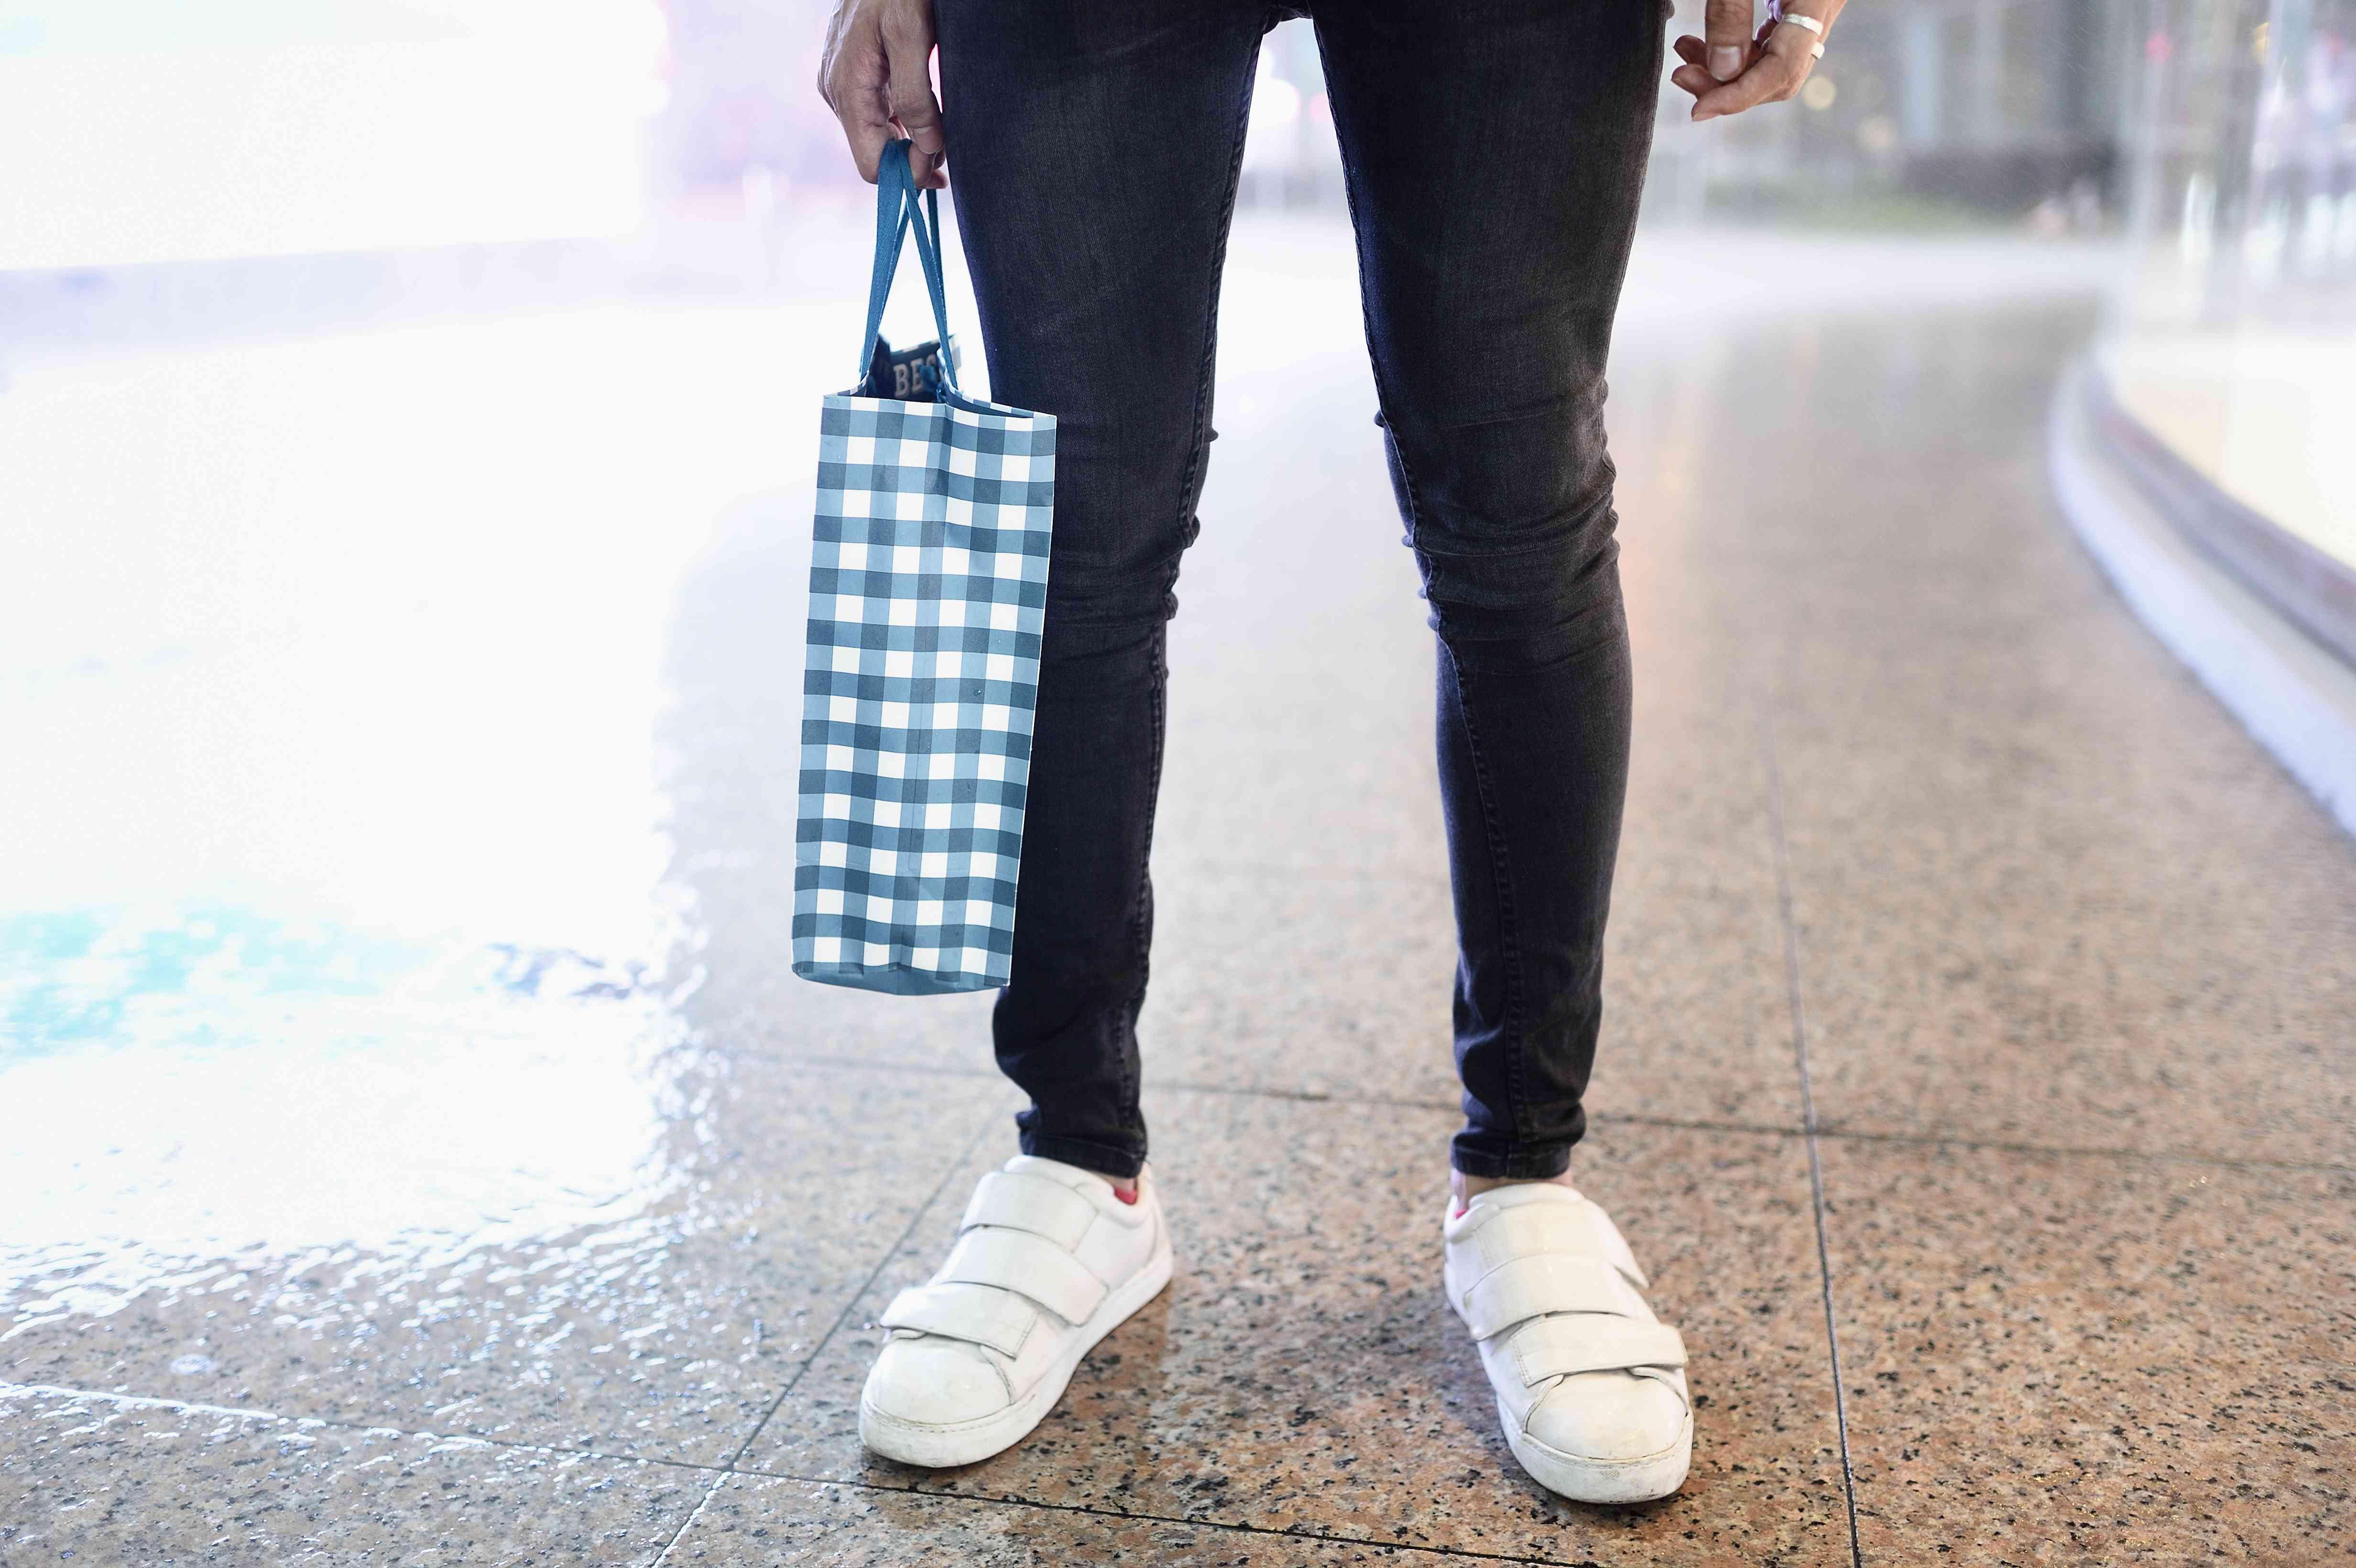 fashionable man's wearing skinny jeans